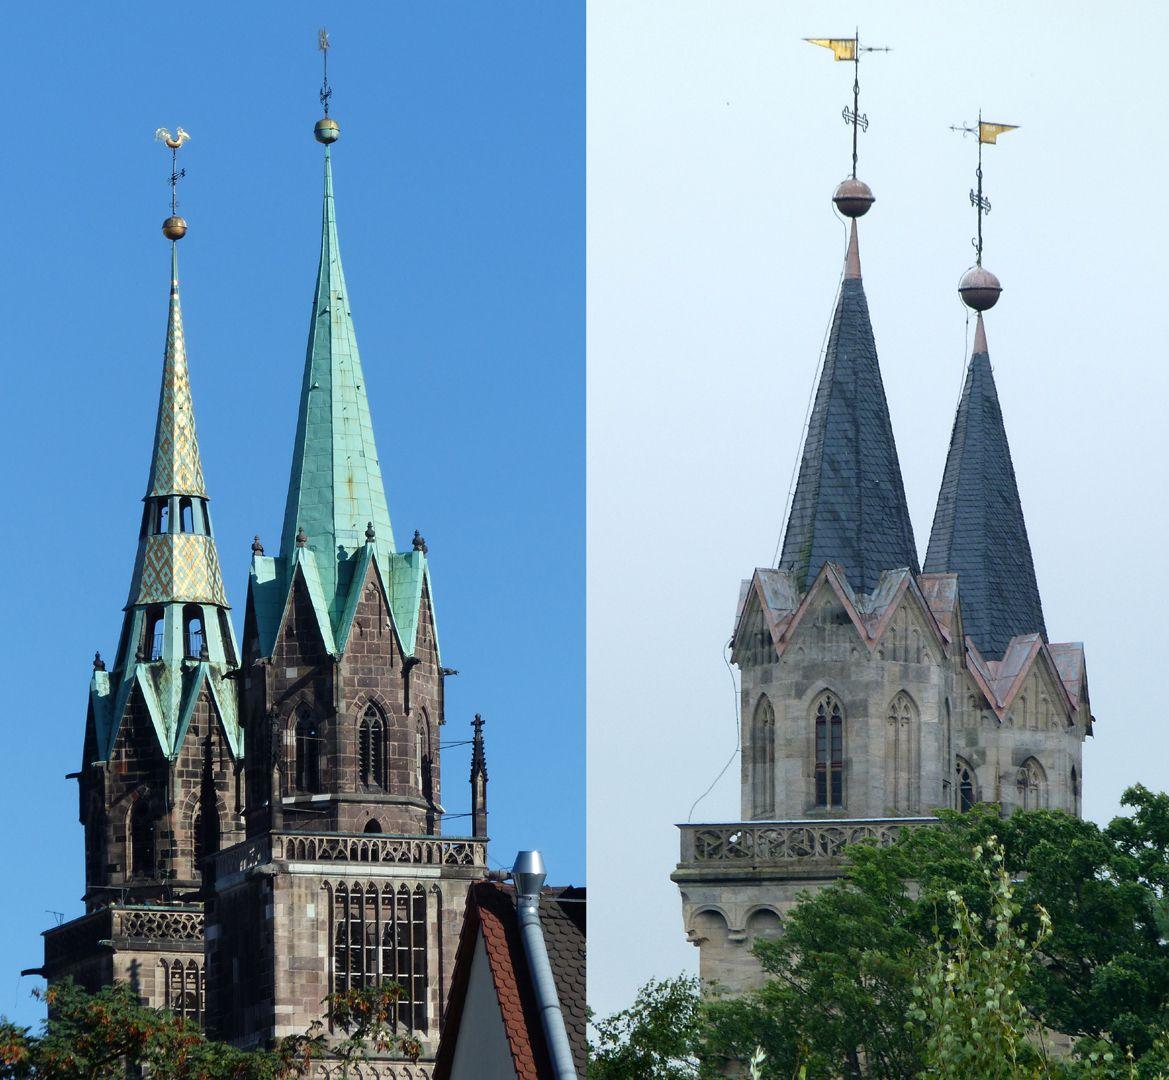 Parish Church St. Peter´s (Sonneberg) Comparison: eight-cornered spires, St. Lorenz-Church in Nuremberg and St. Peter´s in Sonneberg